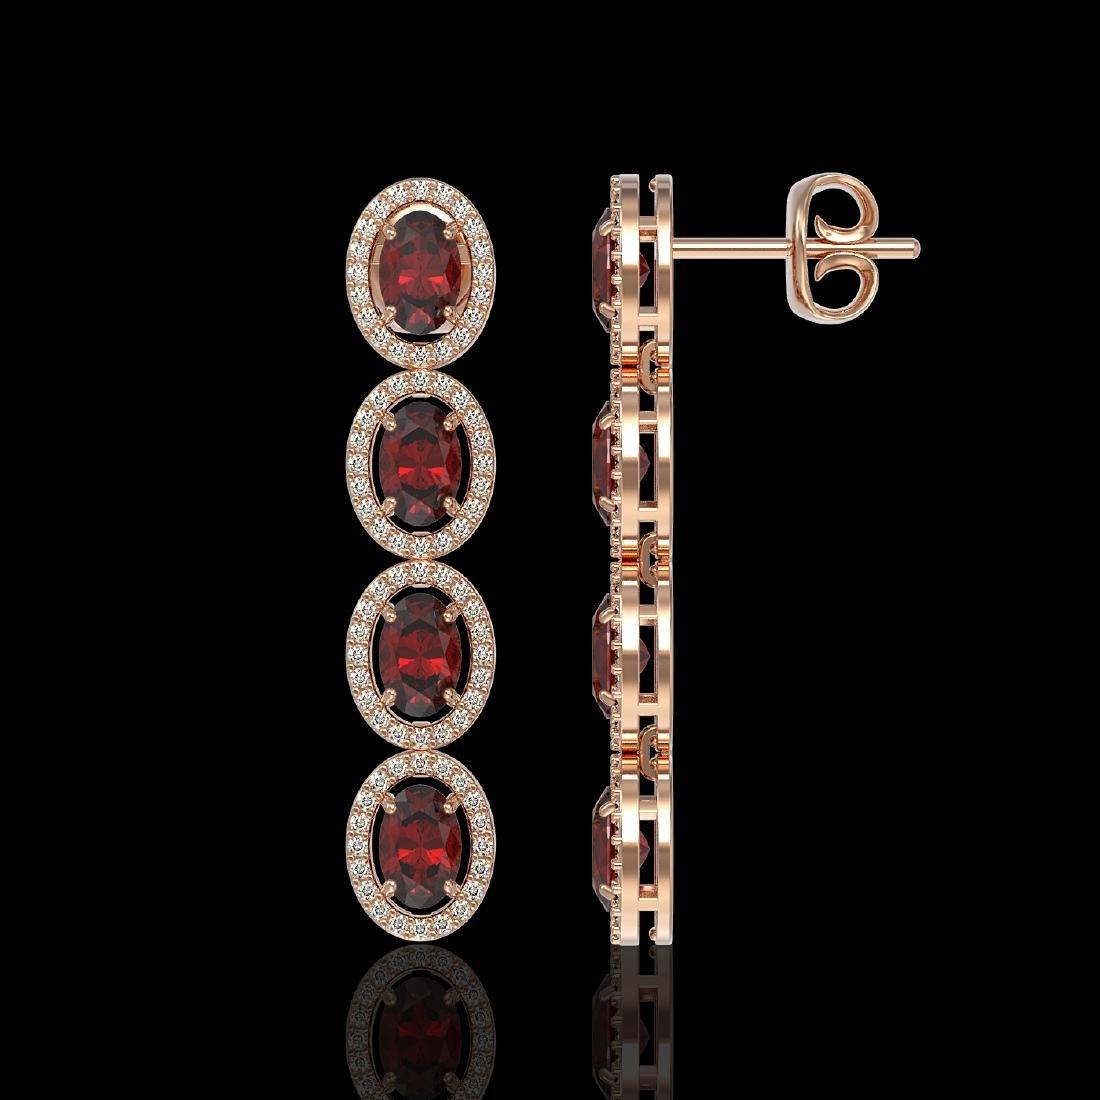 6.2 CTW Garnet & Diamond Halo Earrings 10K Rose Gold - 2